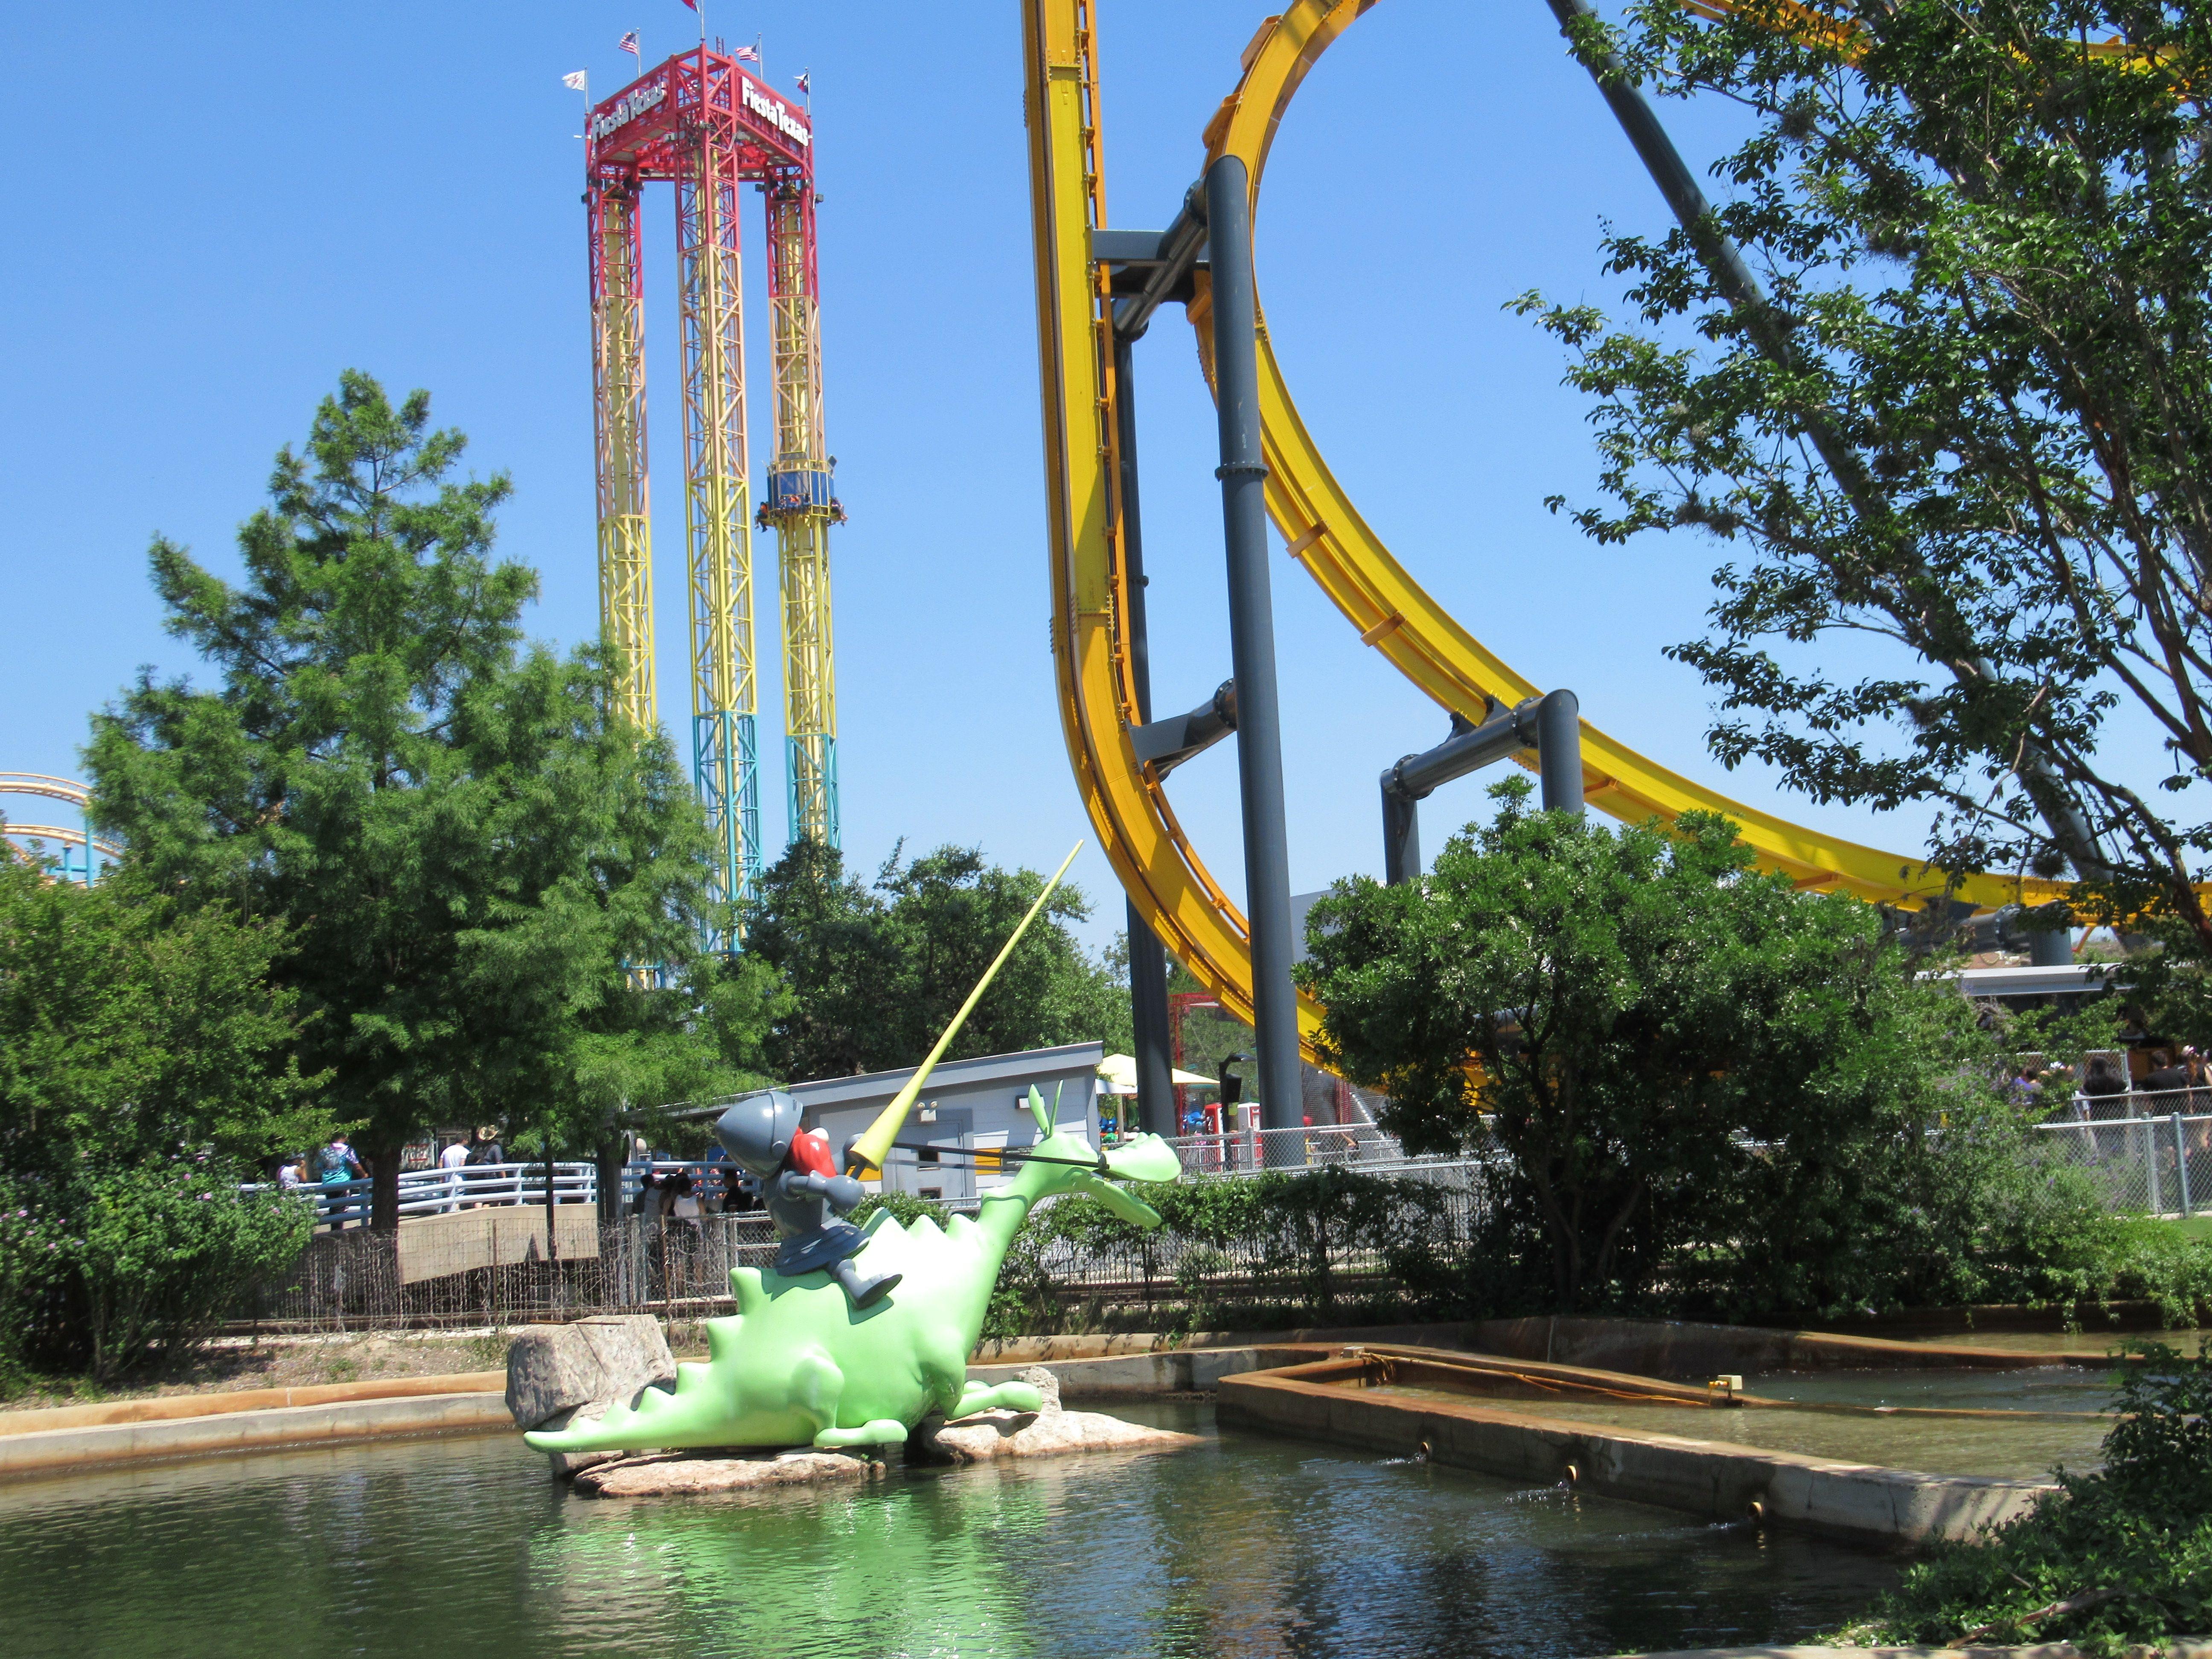 Pin By Thrillseeker360 On Six Flags Fiesta Texas Six Flags Fiesta Texas Six Flags Fair Grounds